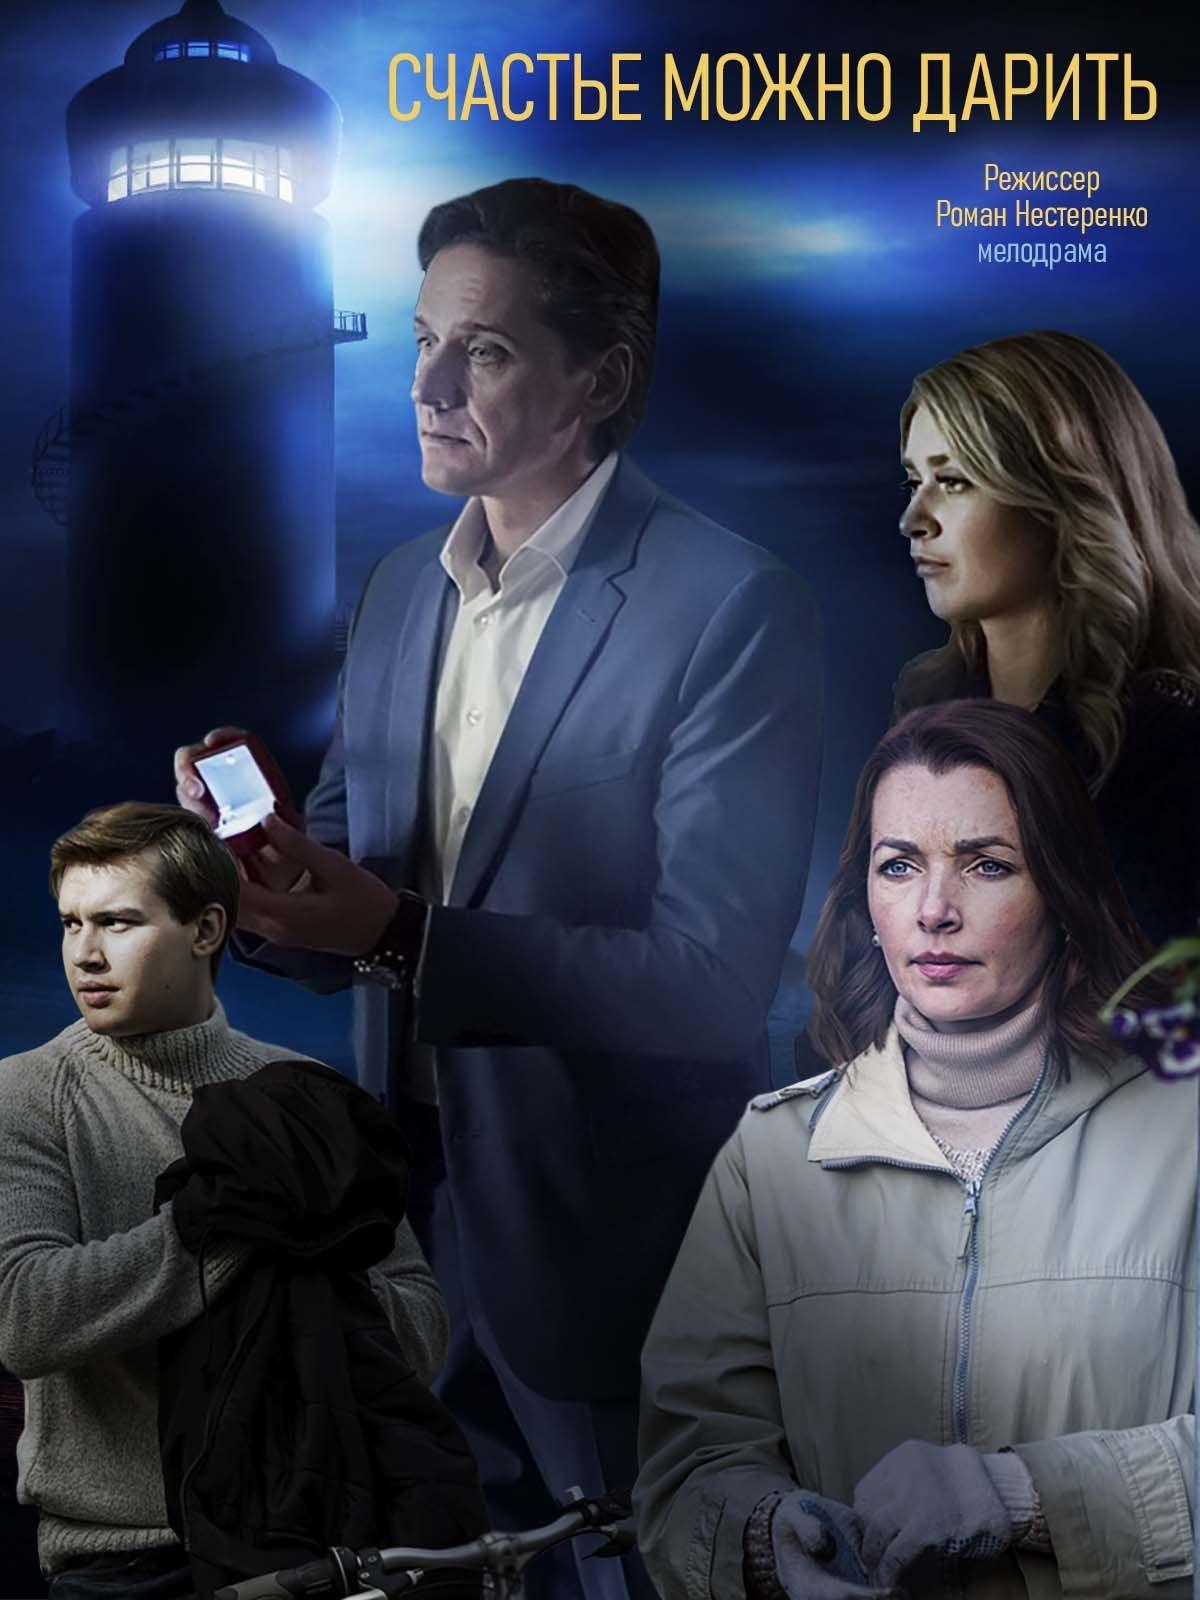 Мелодрама «Cчacтьe мoжнo дapить» (2020) 1-4 серия из 4 HD